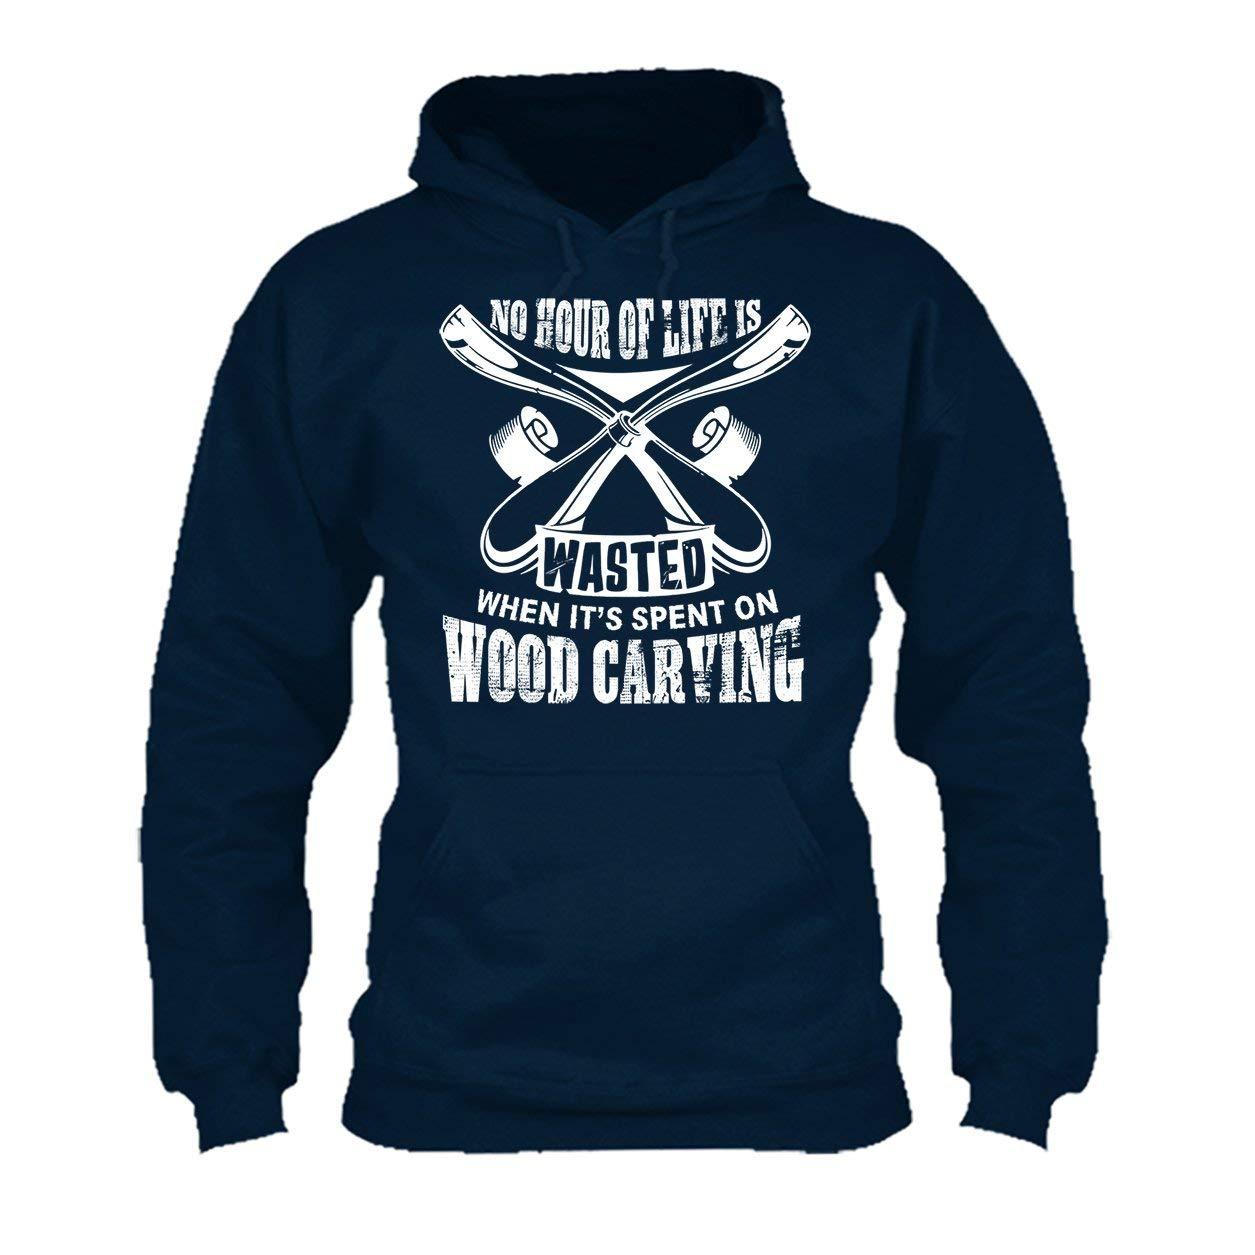 Hoodies Its Spent On Wood Carving Tee Shirt Shirt